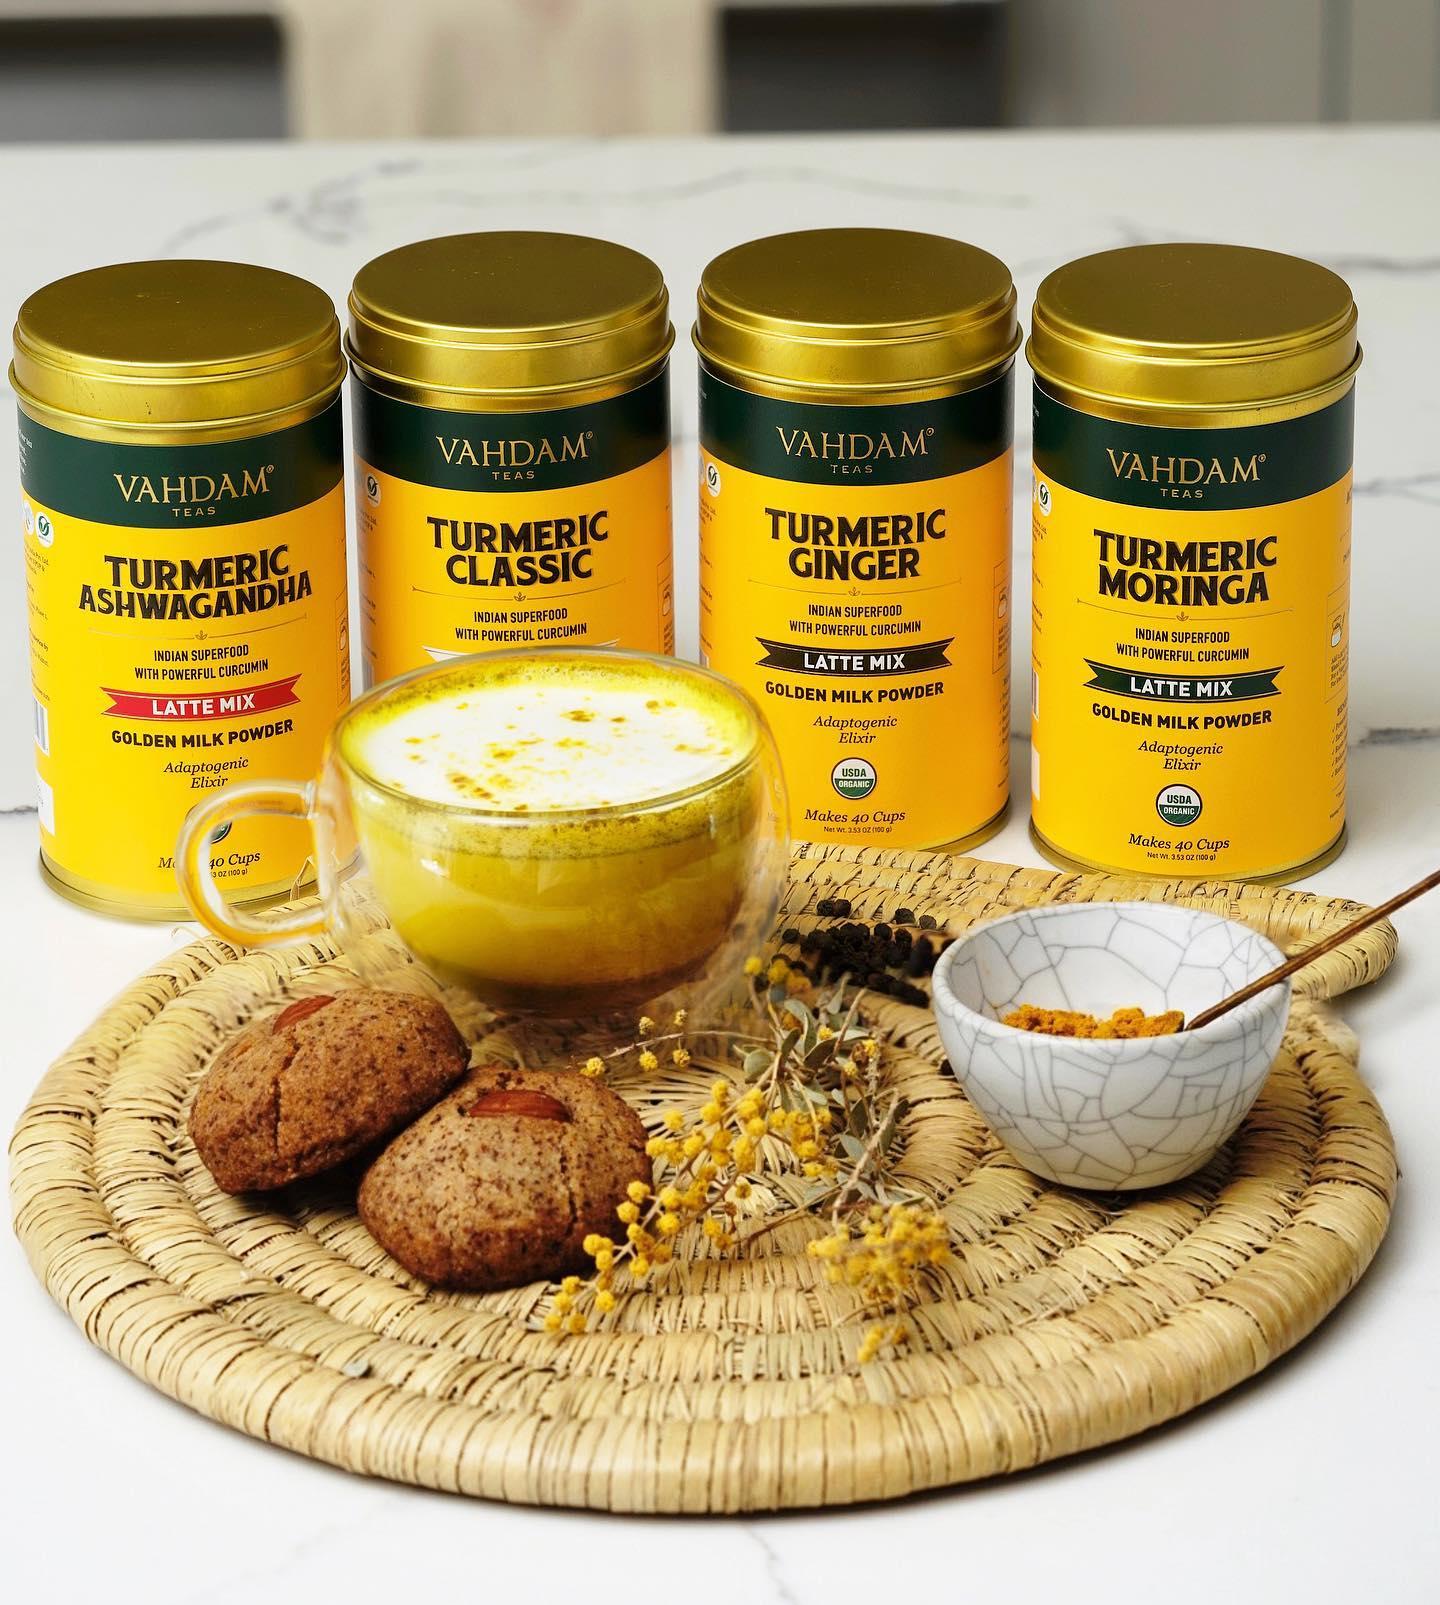 VAHDAM, Turmeric Saffron Herbal Tea, India's Magic Herb To Drink